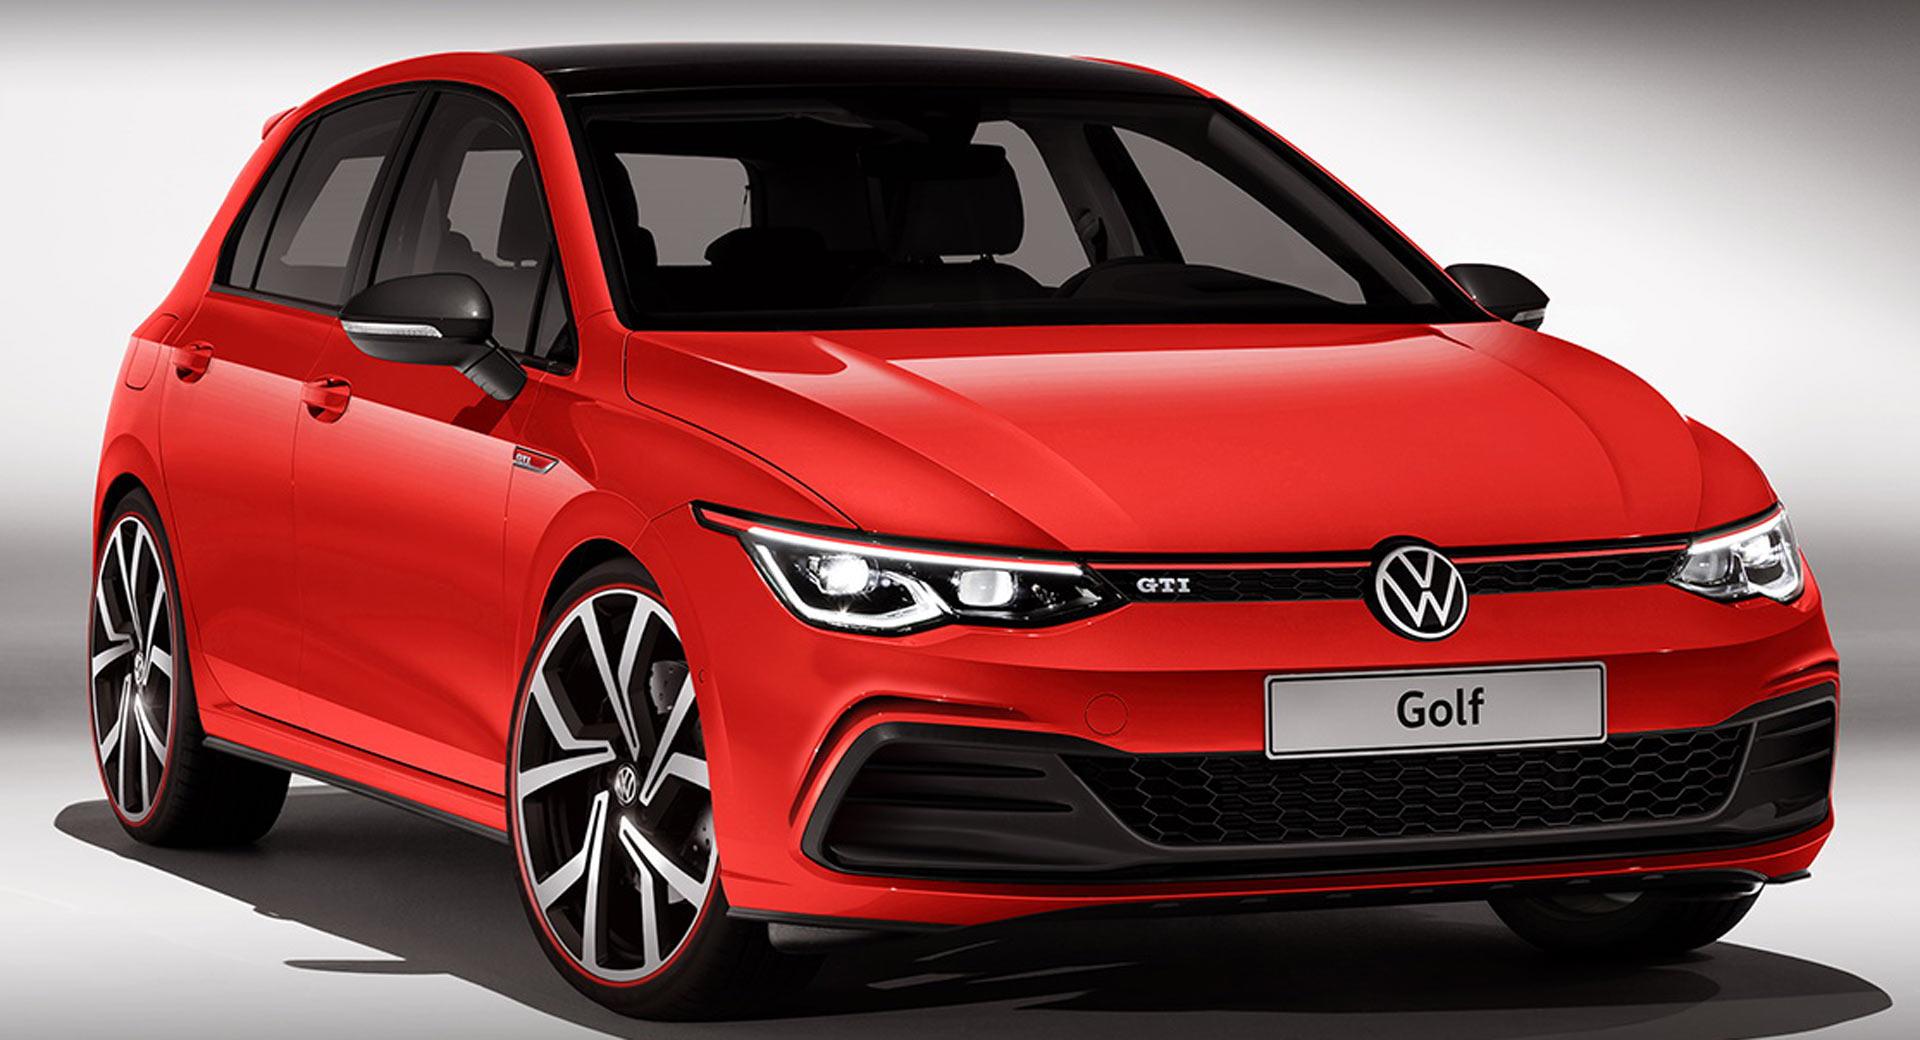 Nuova Volkswagen Golf 8 2020, prima uscita al Salone di Ginevra?